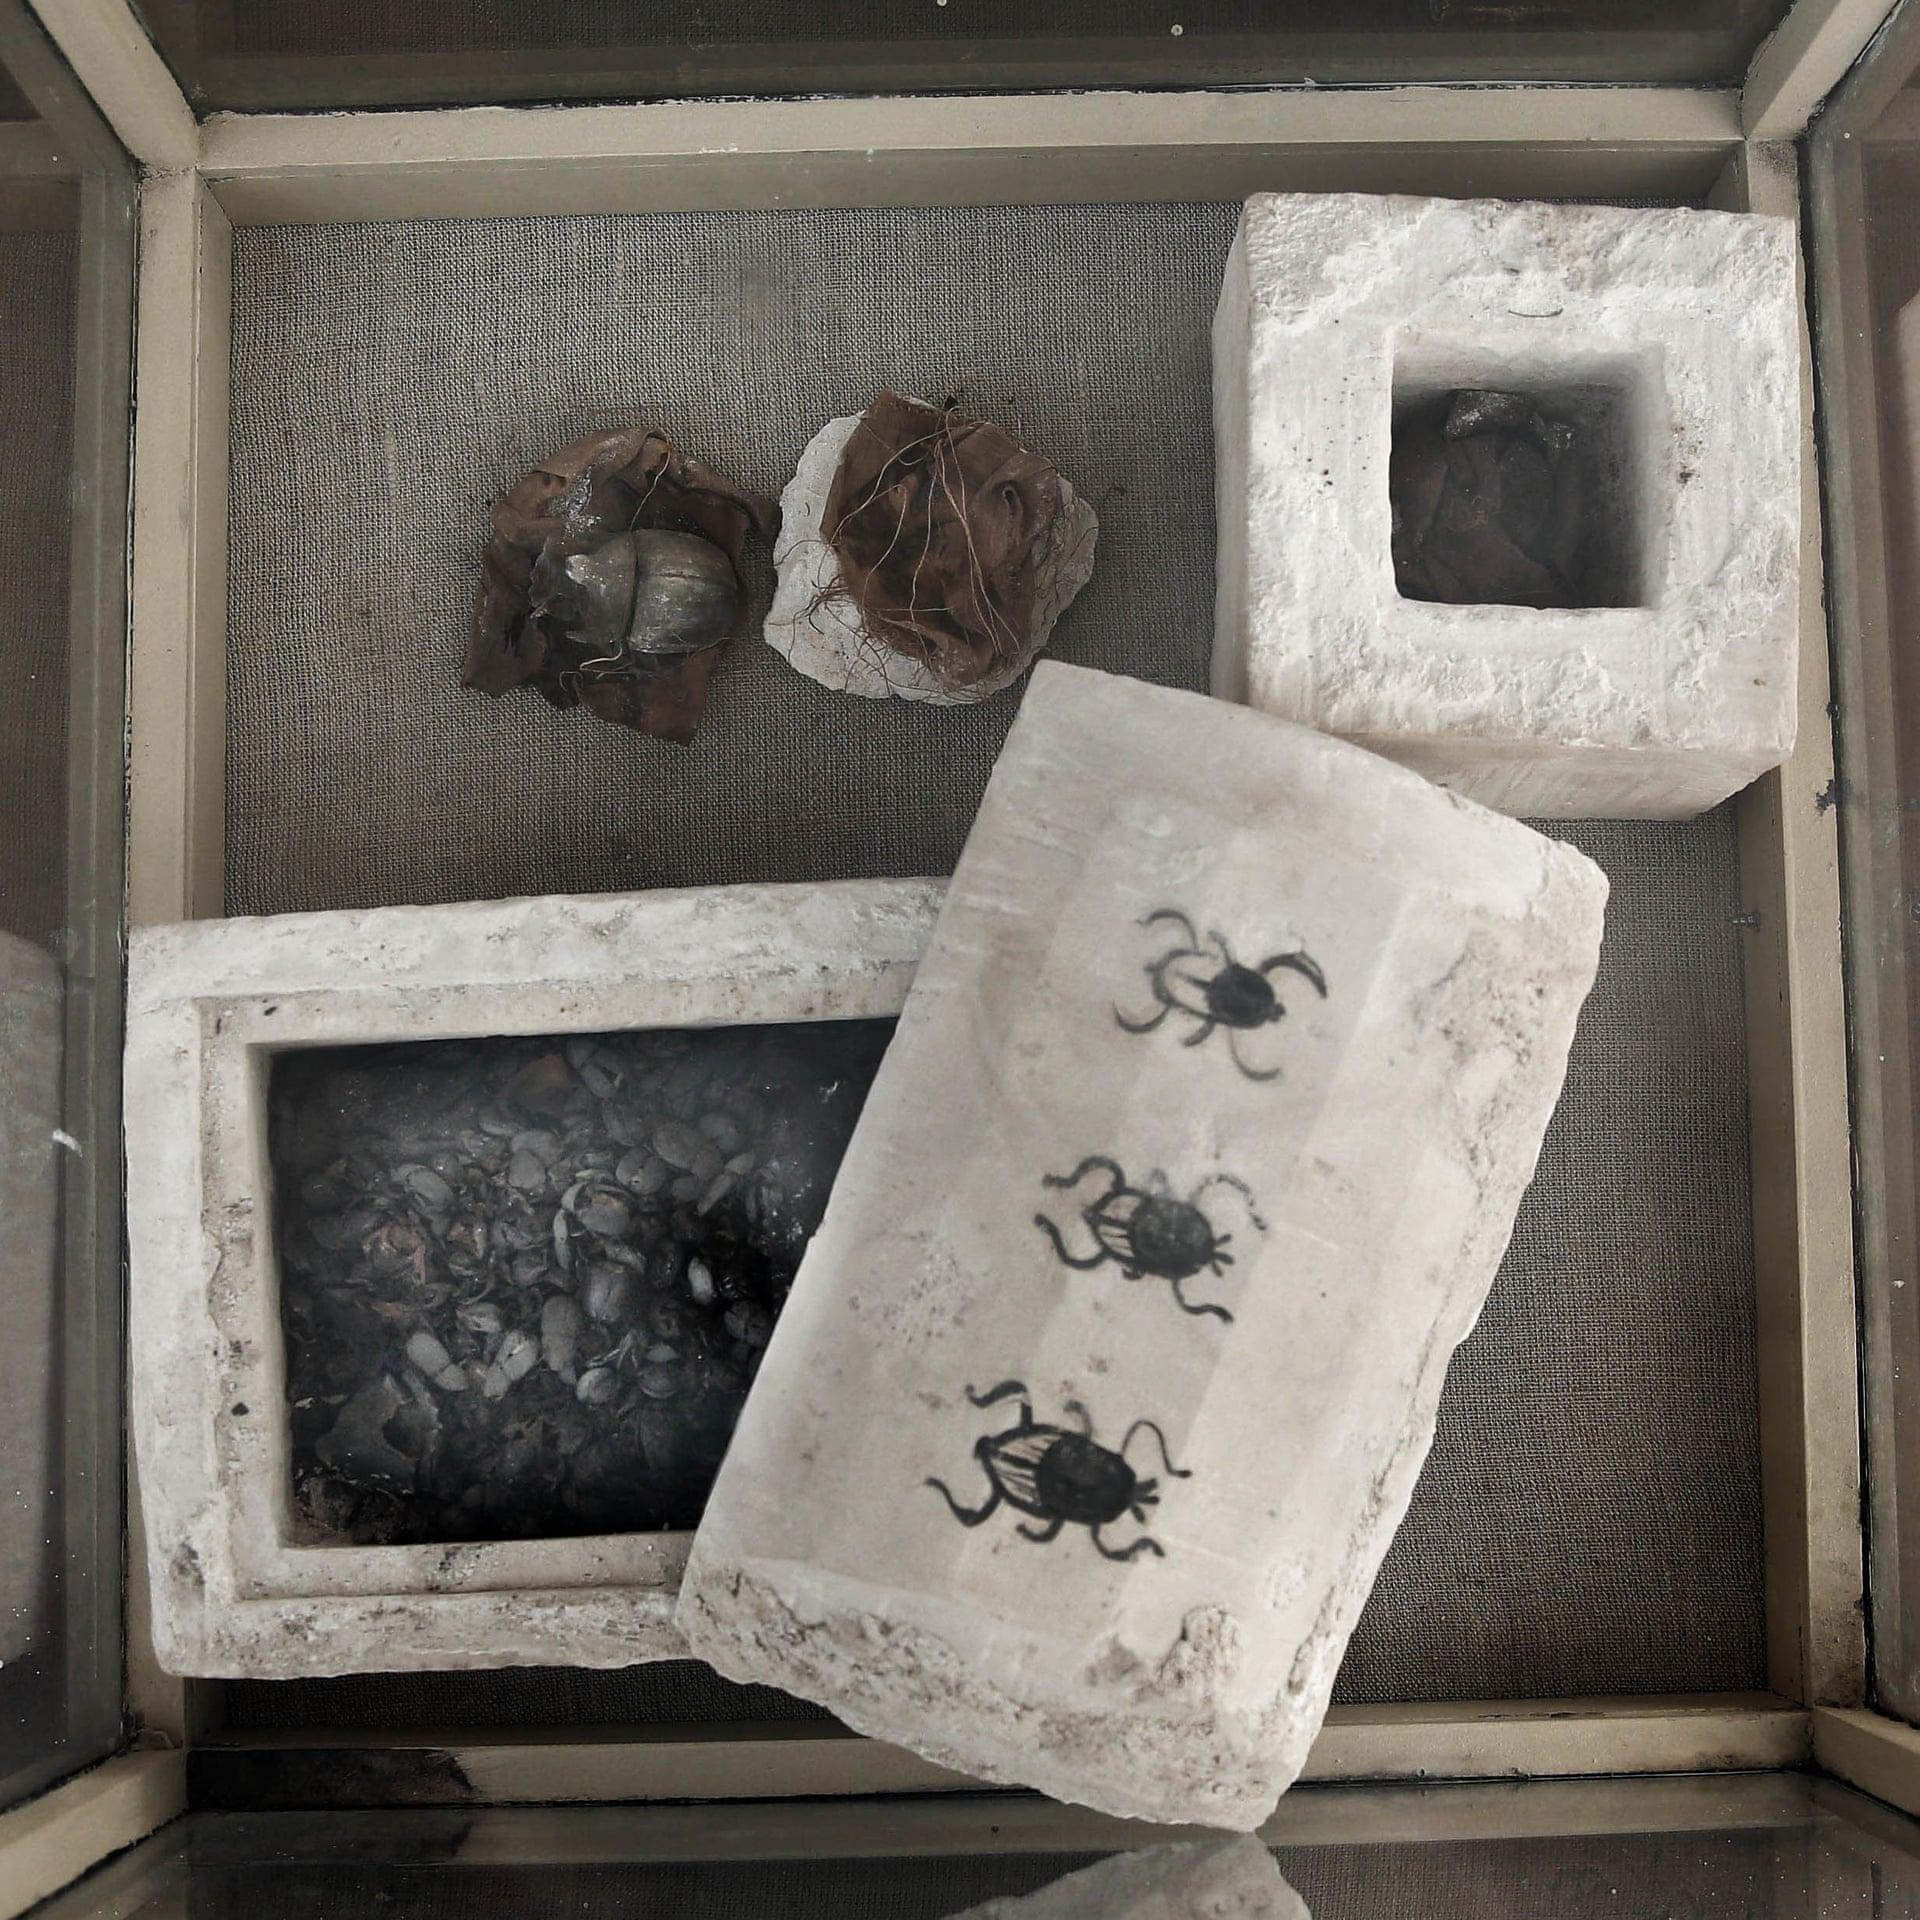 Besouros mumificados